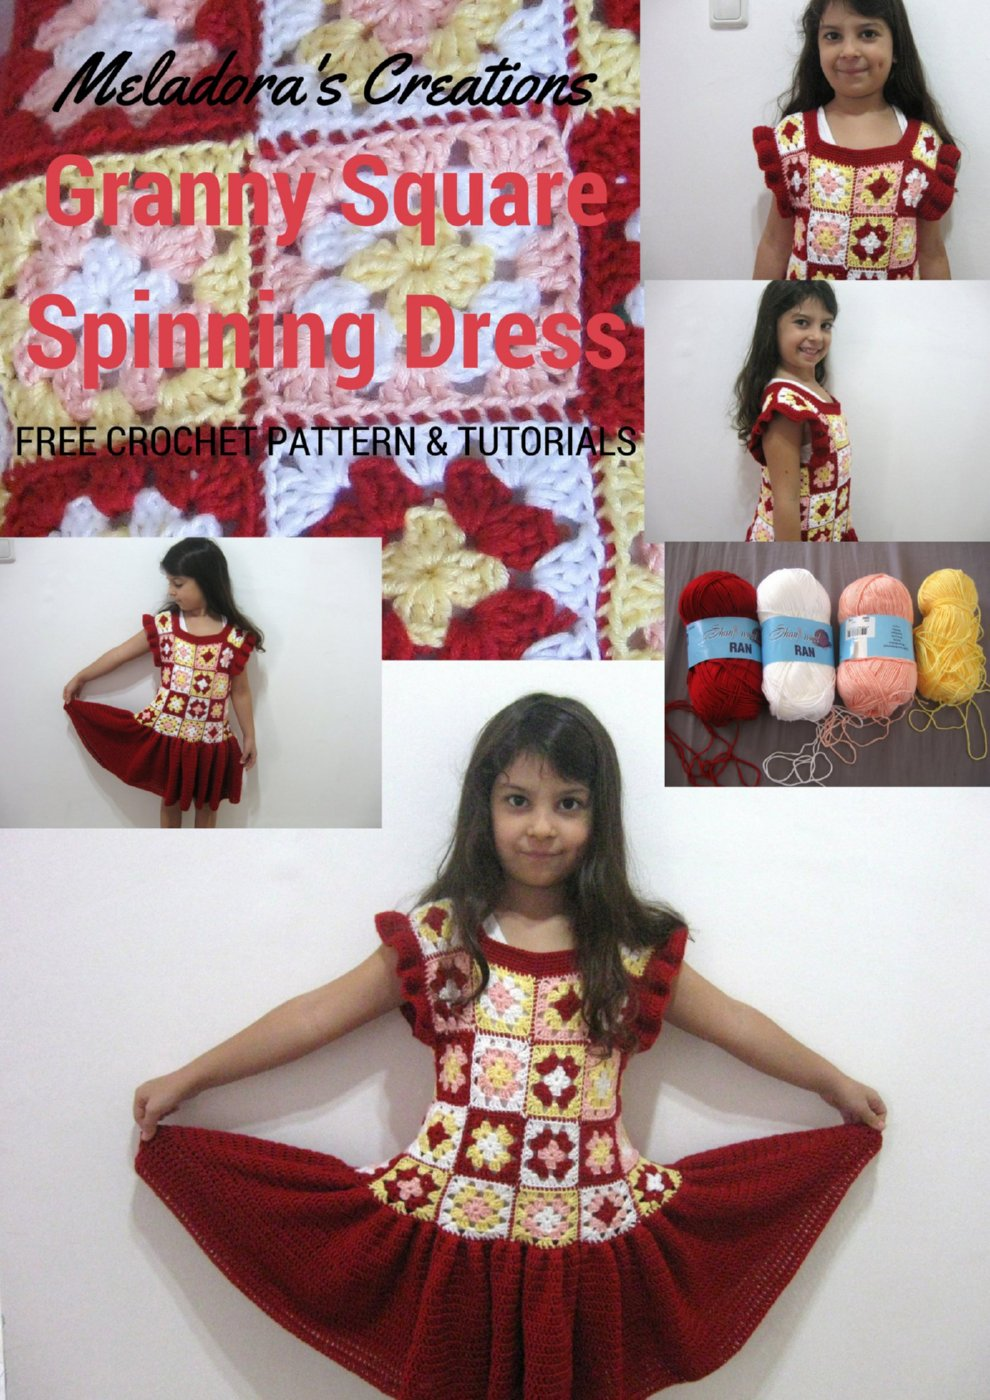 Boho Chic Dress Tutorial - Granny Square Spinning Dress - Free Crochet Pattern and Tutorial